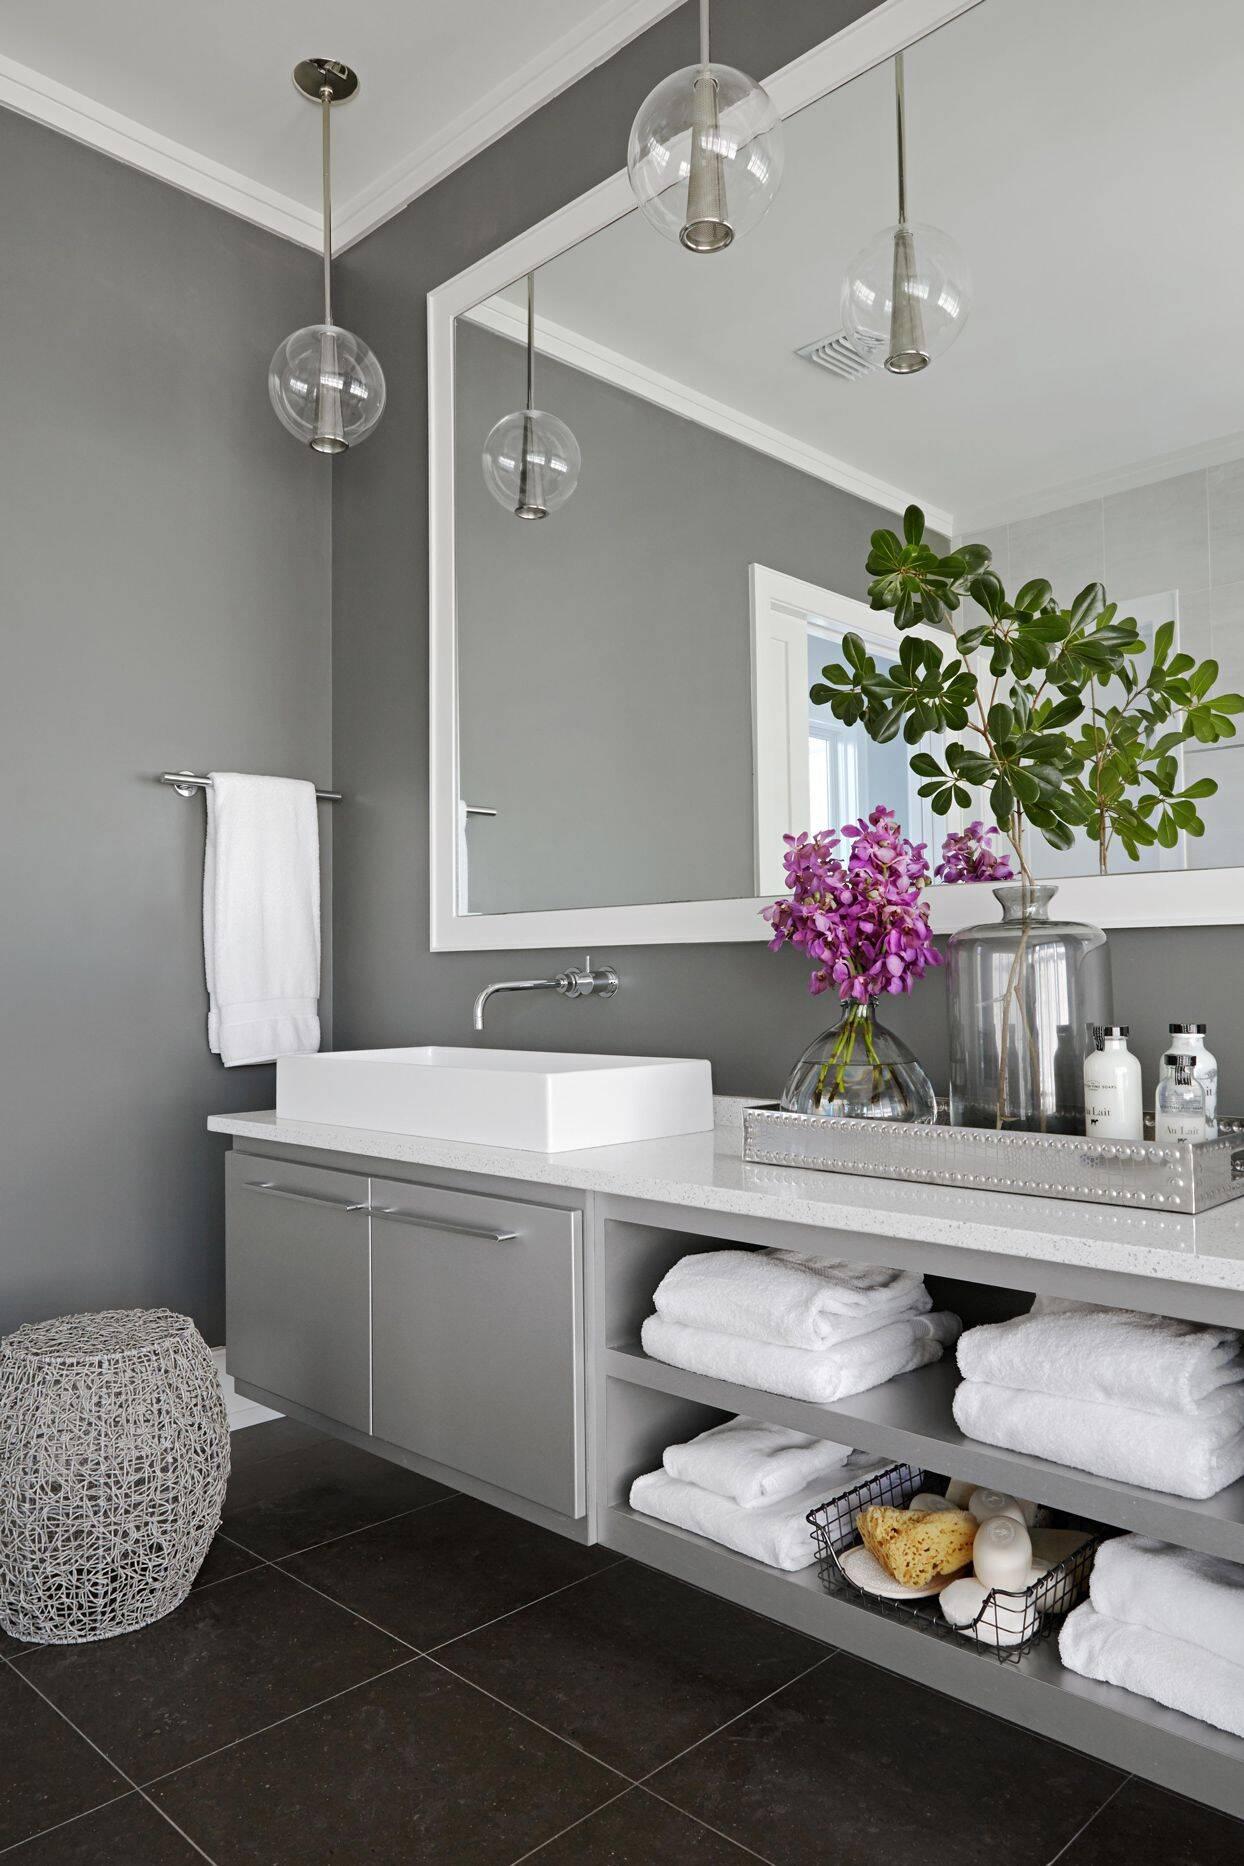 Banheiro minimalista